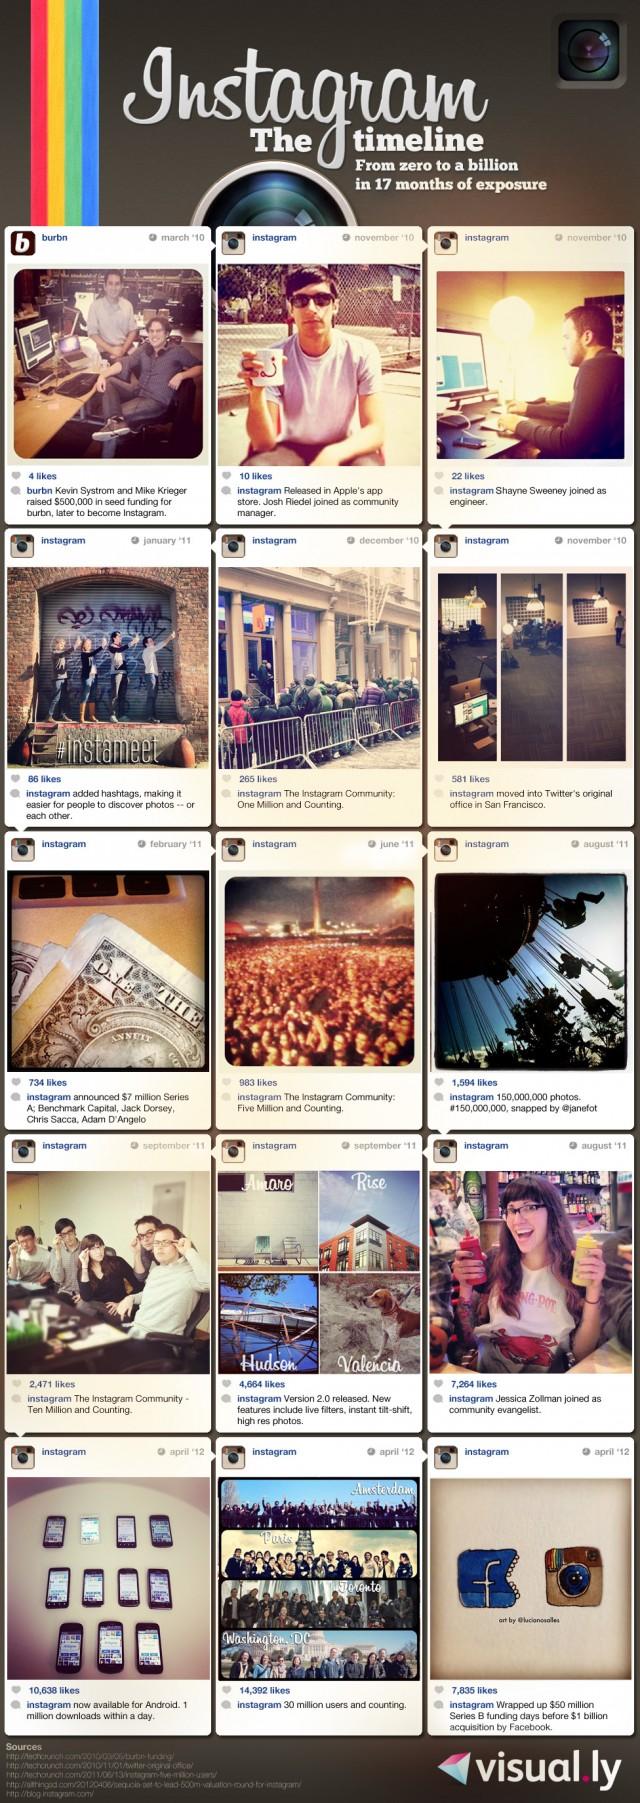 Instagram milliard dollars mois infographie